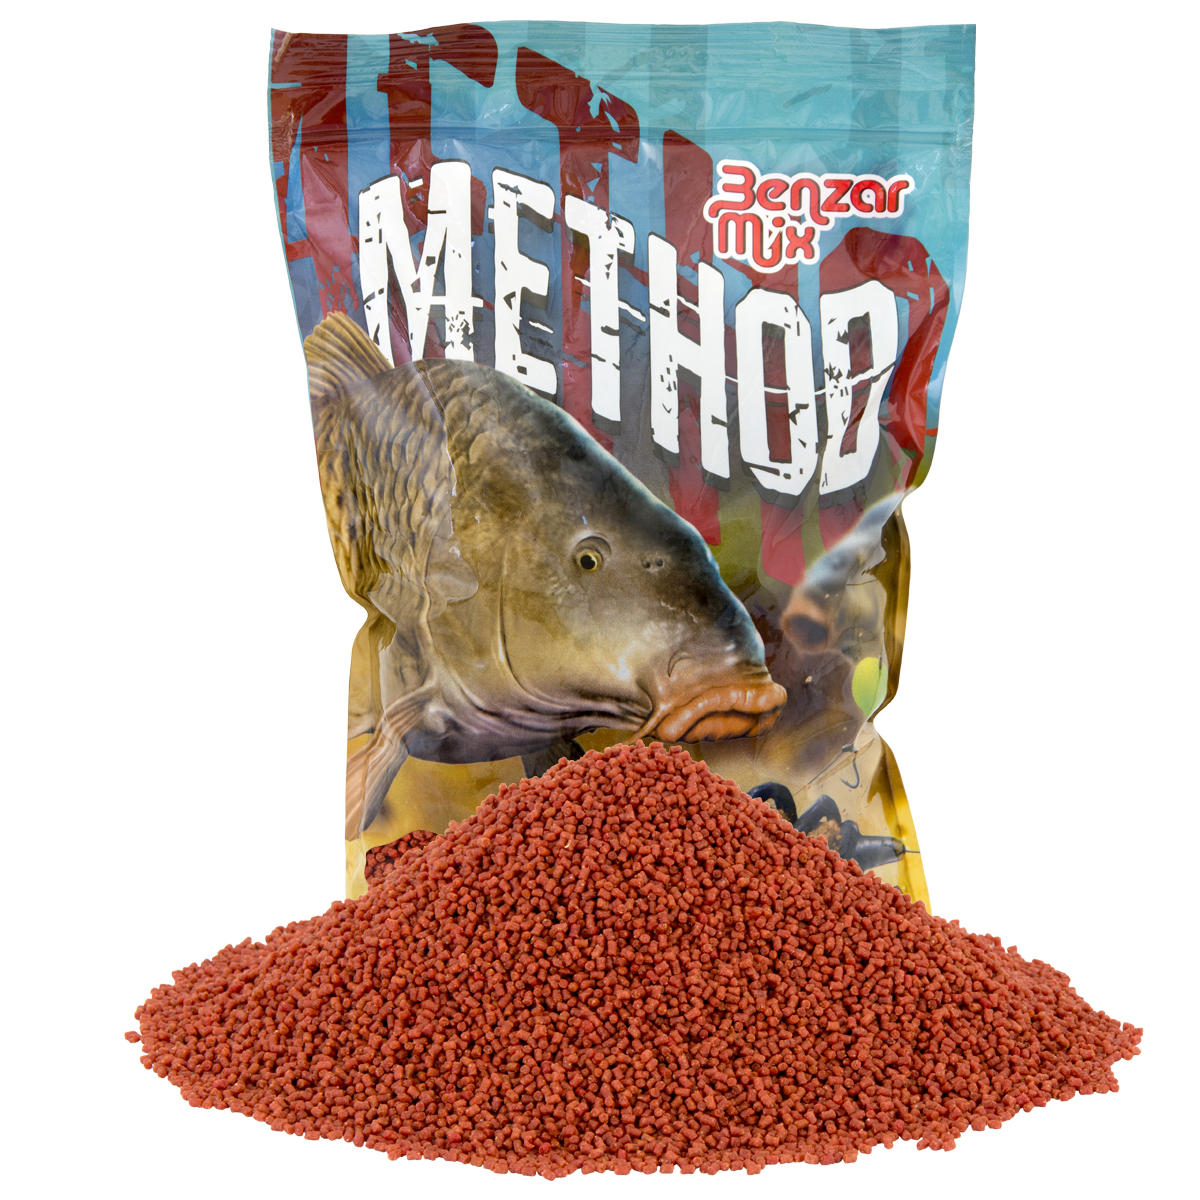 BENZAR MIX METHOD PELLET EPER-FISH 2MM 800GR